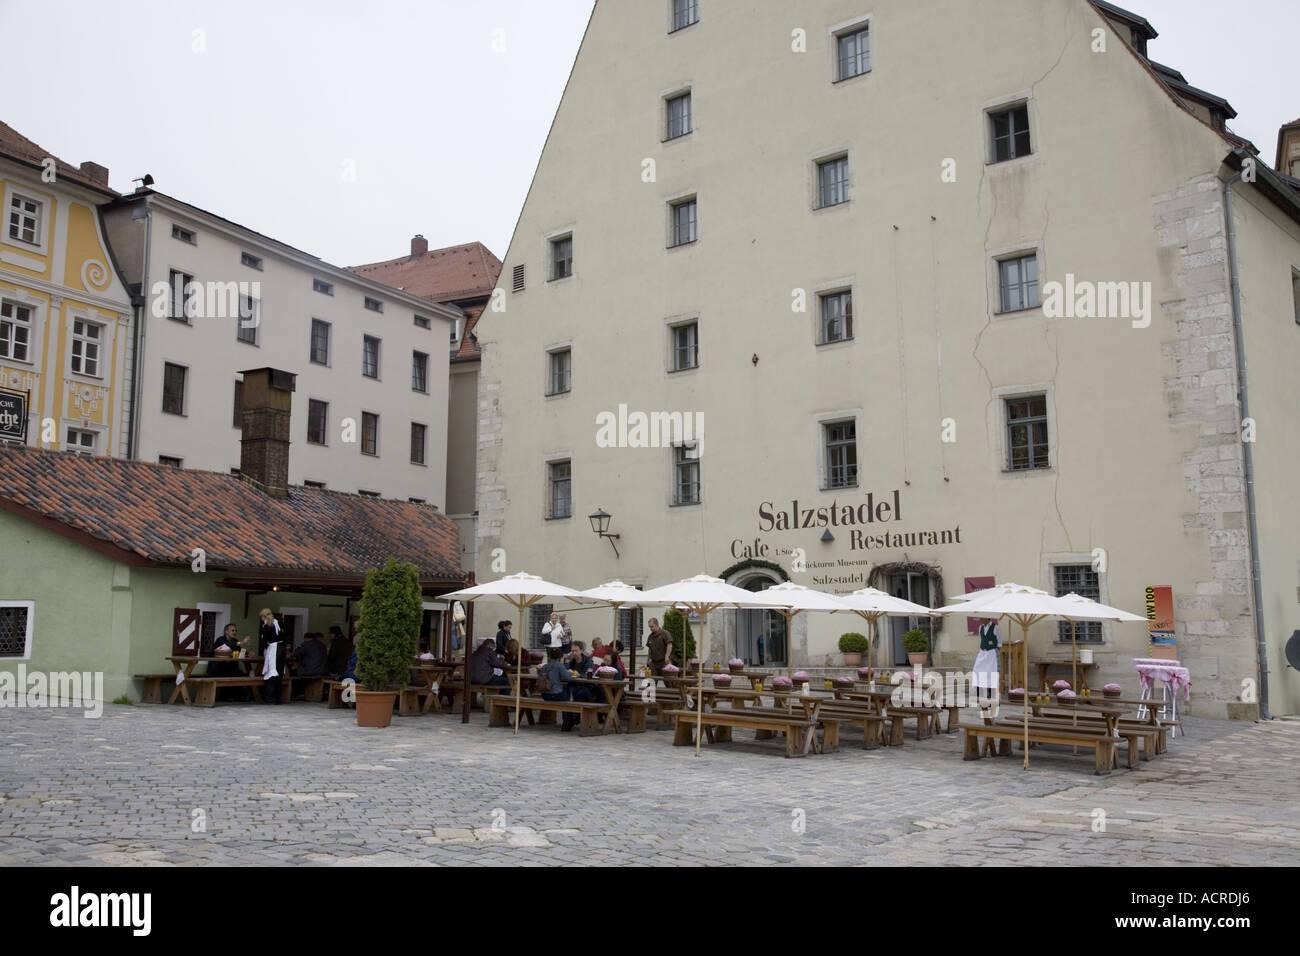 salzstadel cafe and restaurant regensburg germany stock photo royalty free image 7552229 alamy. Black Bedroom Furniture Sets. Home Design Ideas